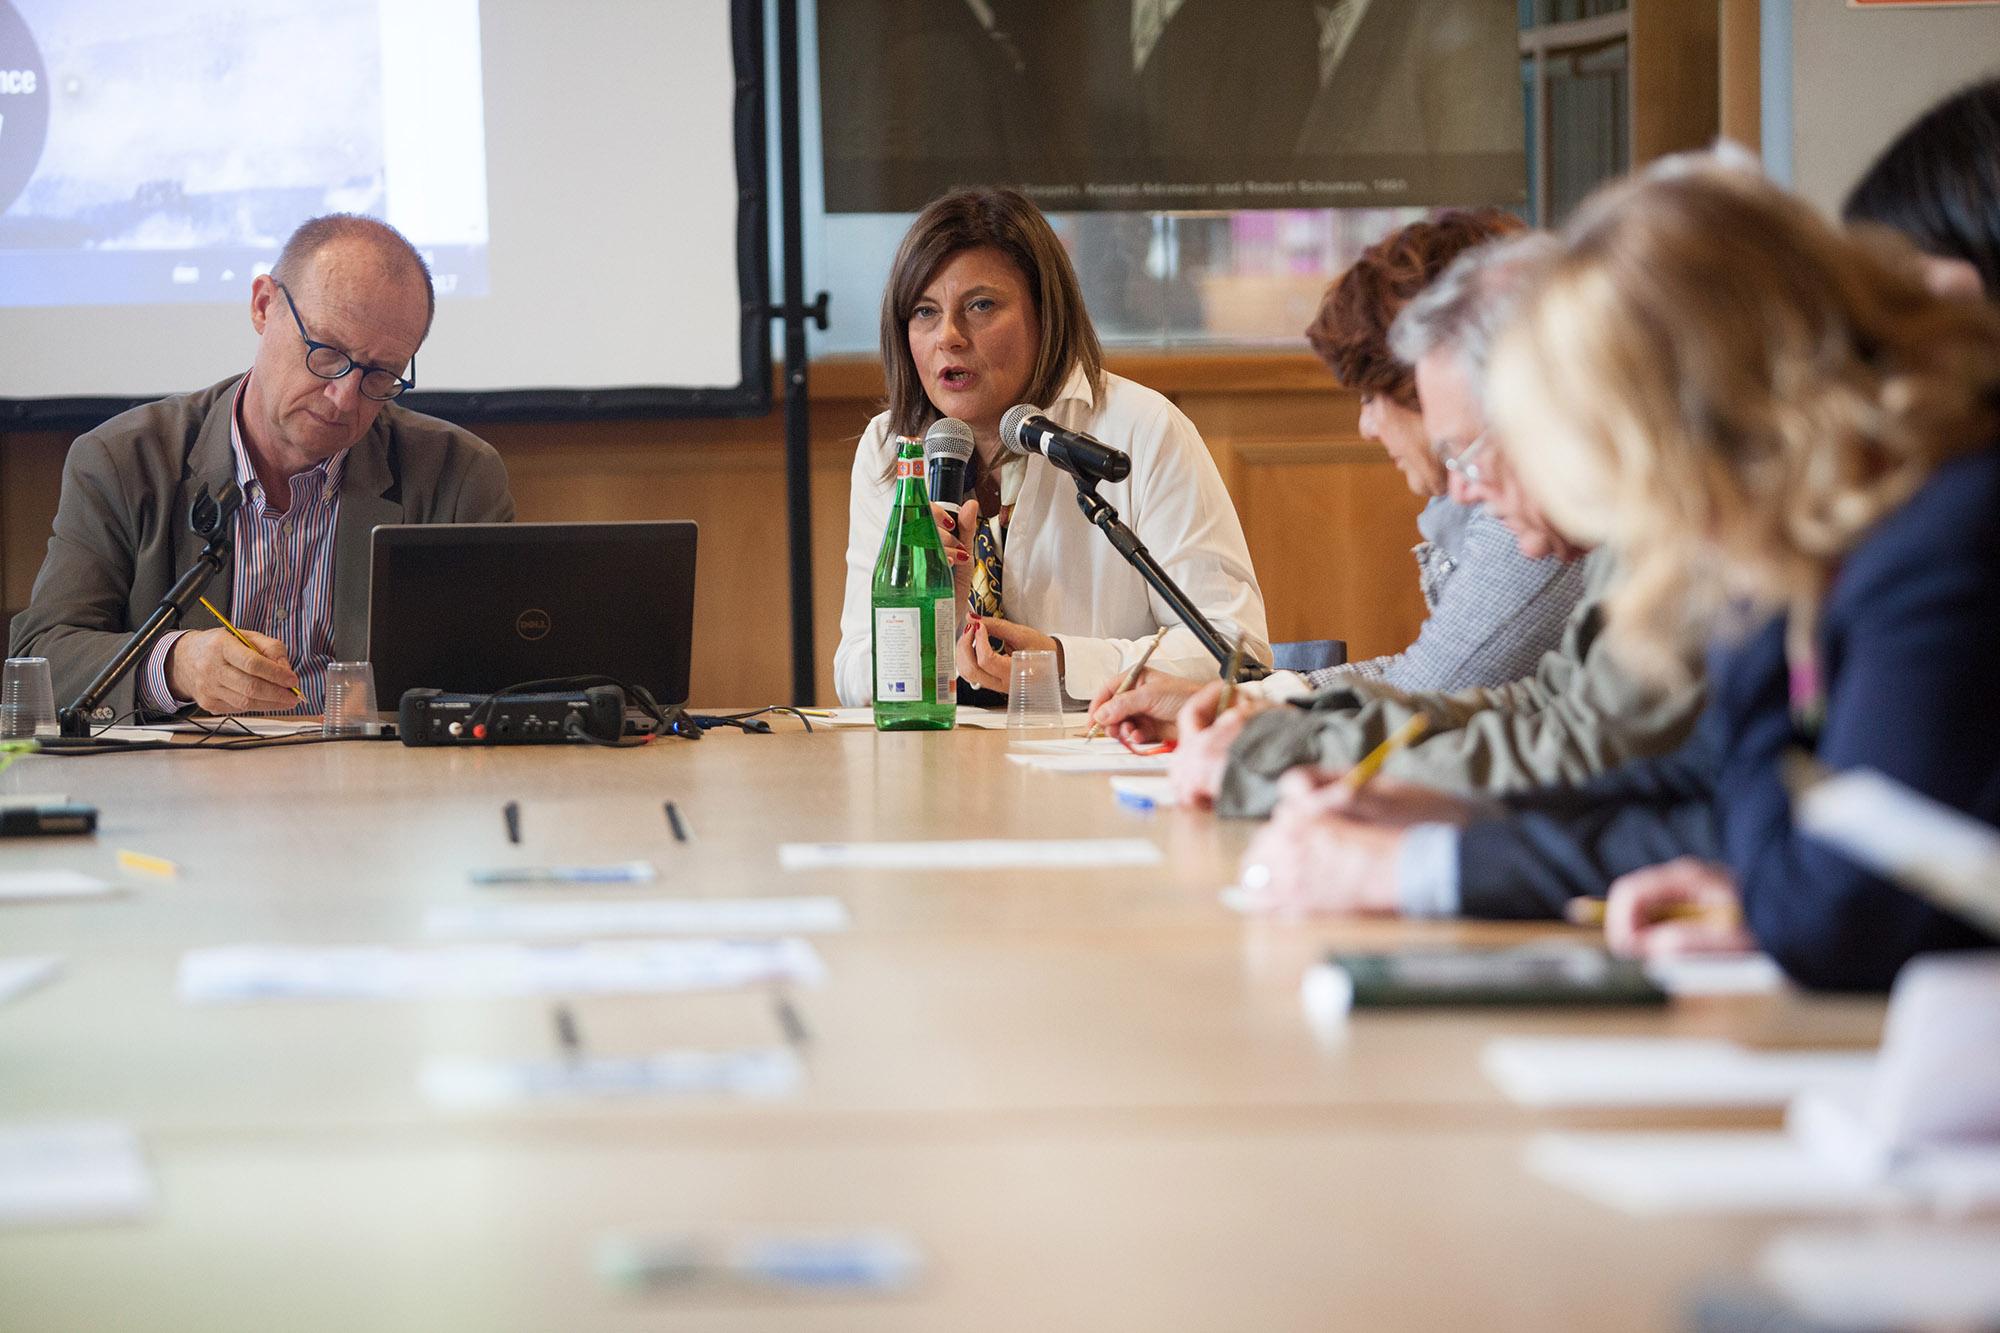 2017-05-11 Gli Archivi e la Public History - Conversation with Serge Noiret 07